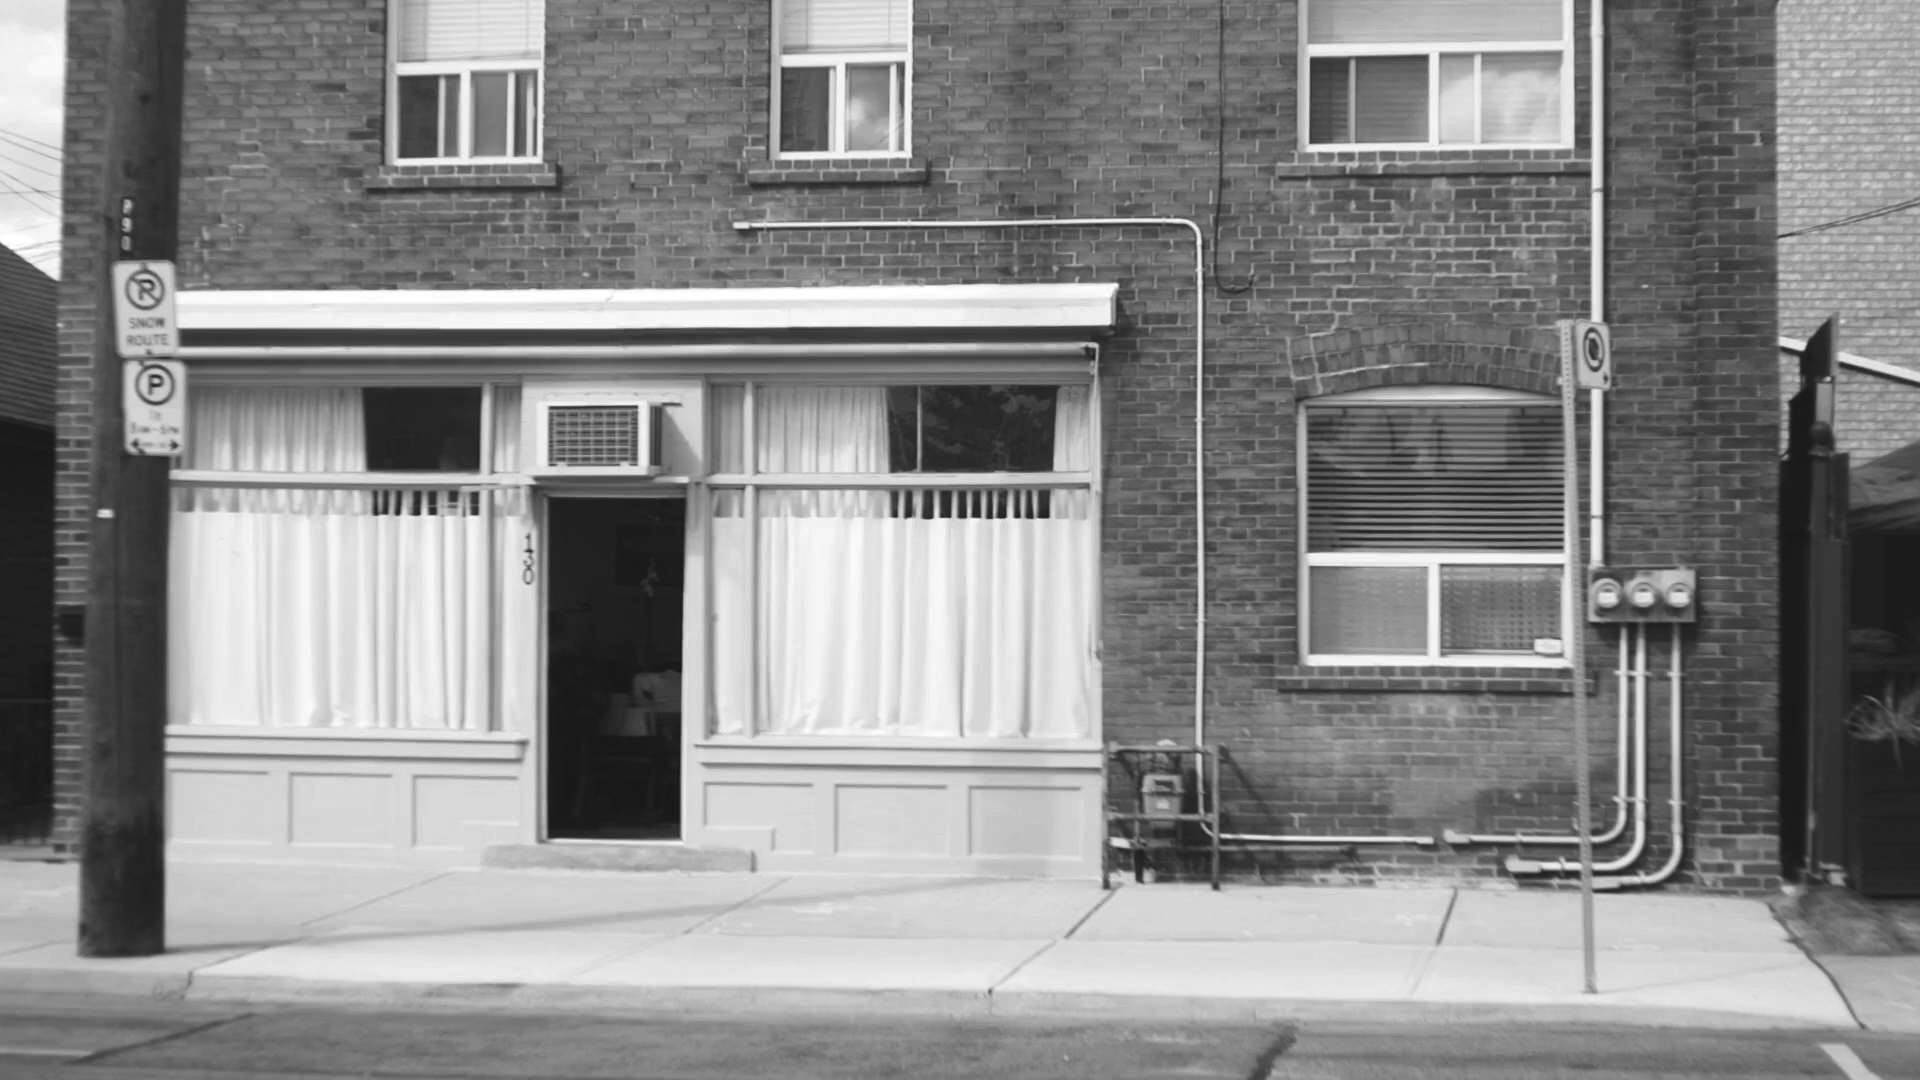 City Of Toronto - Promo Video